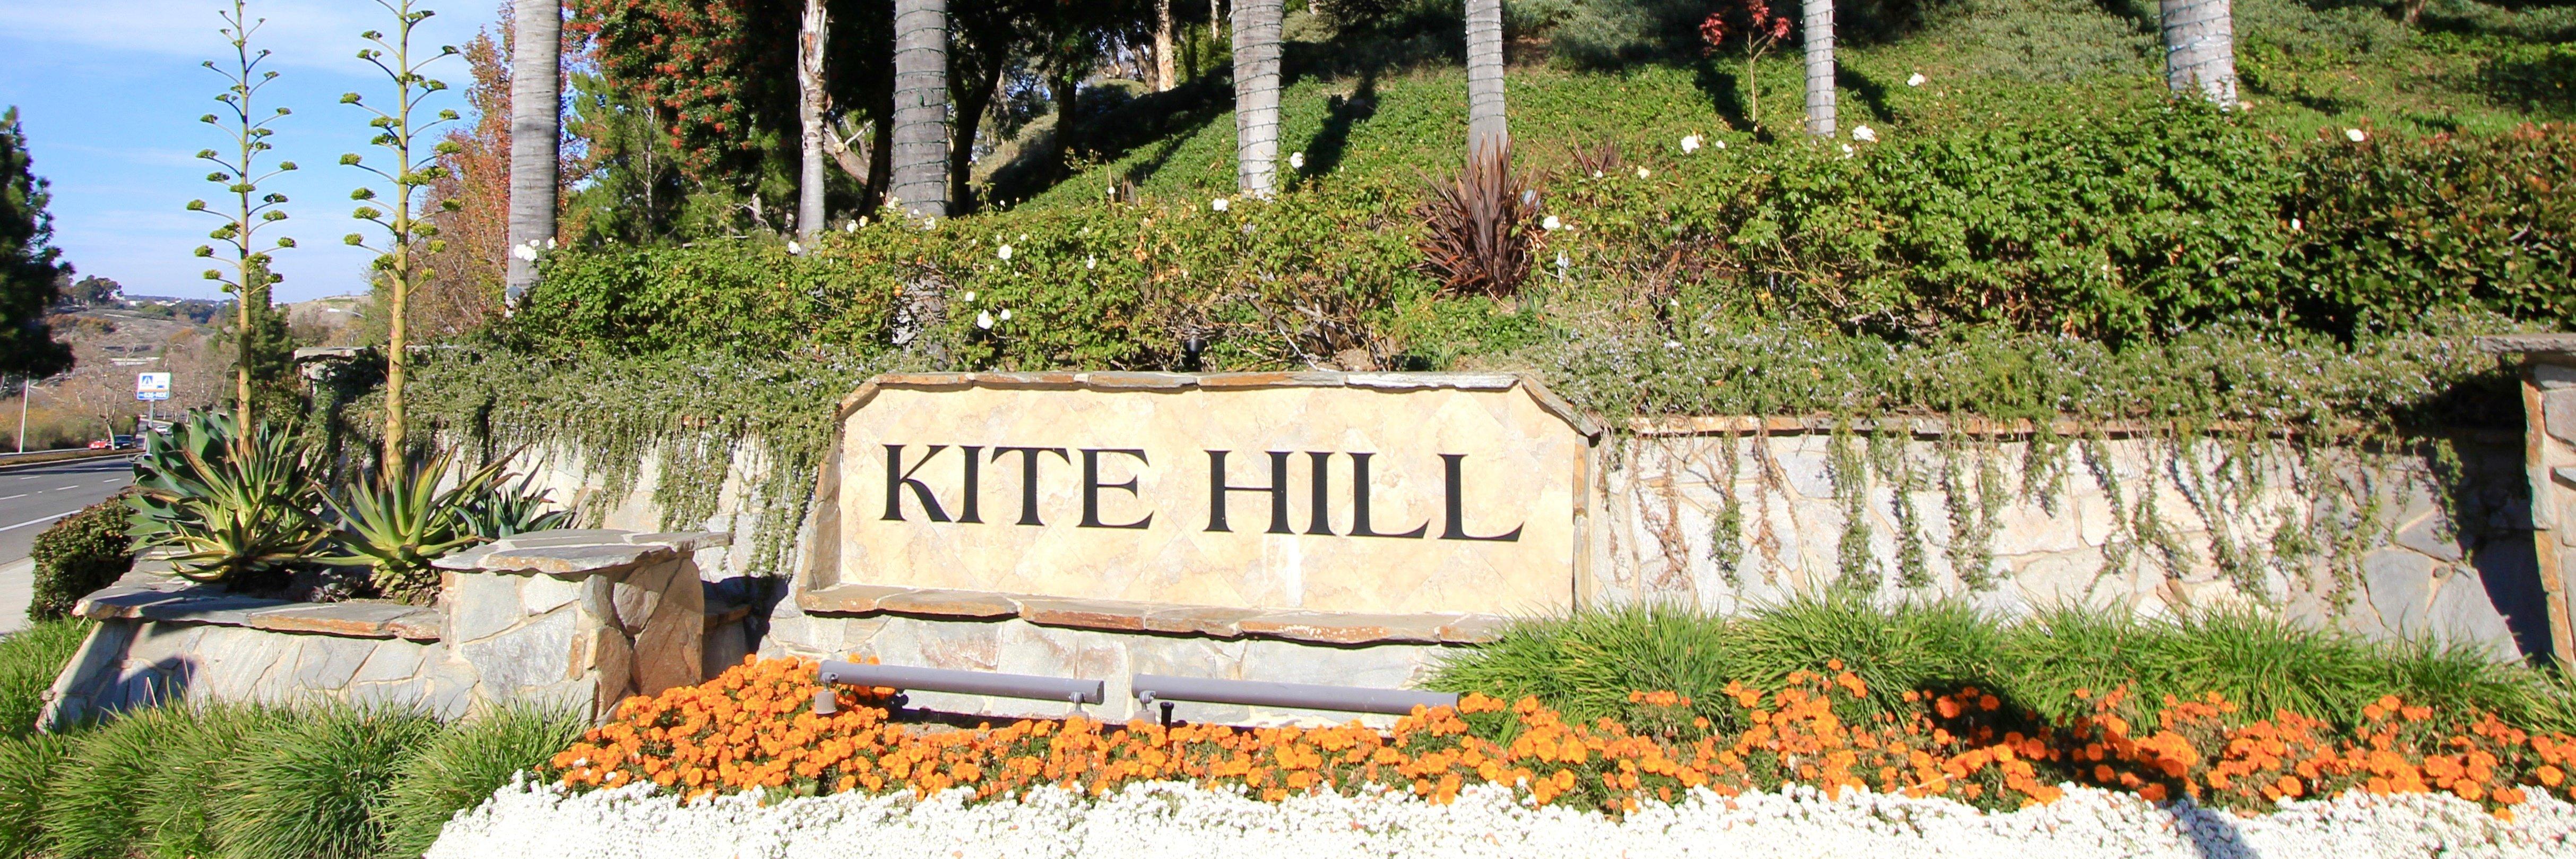 Kite Hill is a neighborhood of homes located in Laguna Niguel California